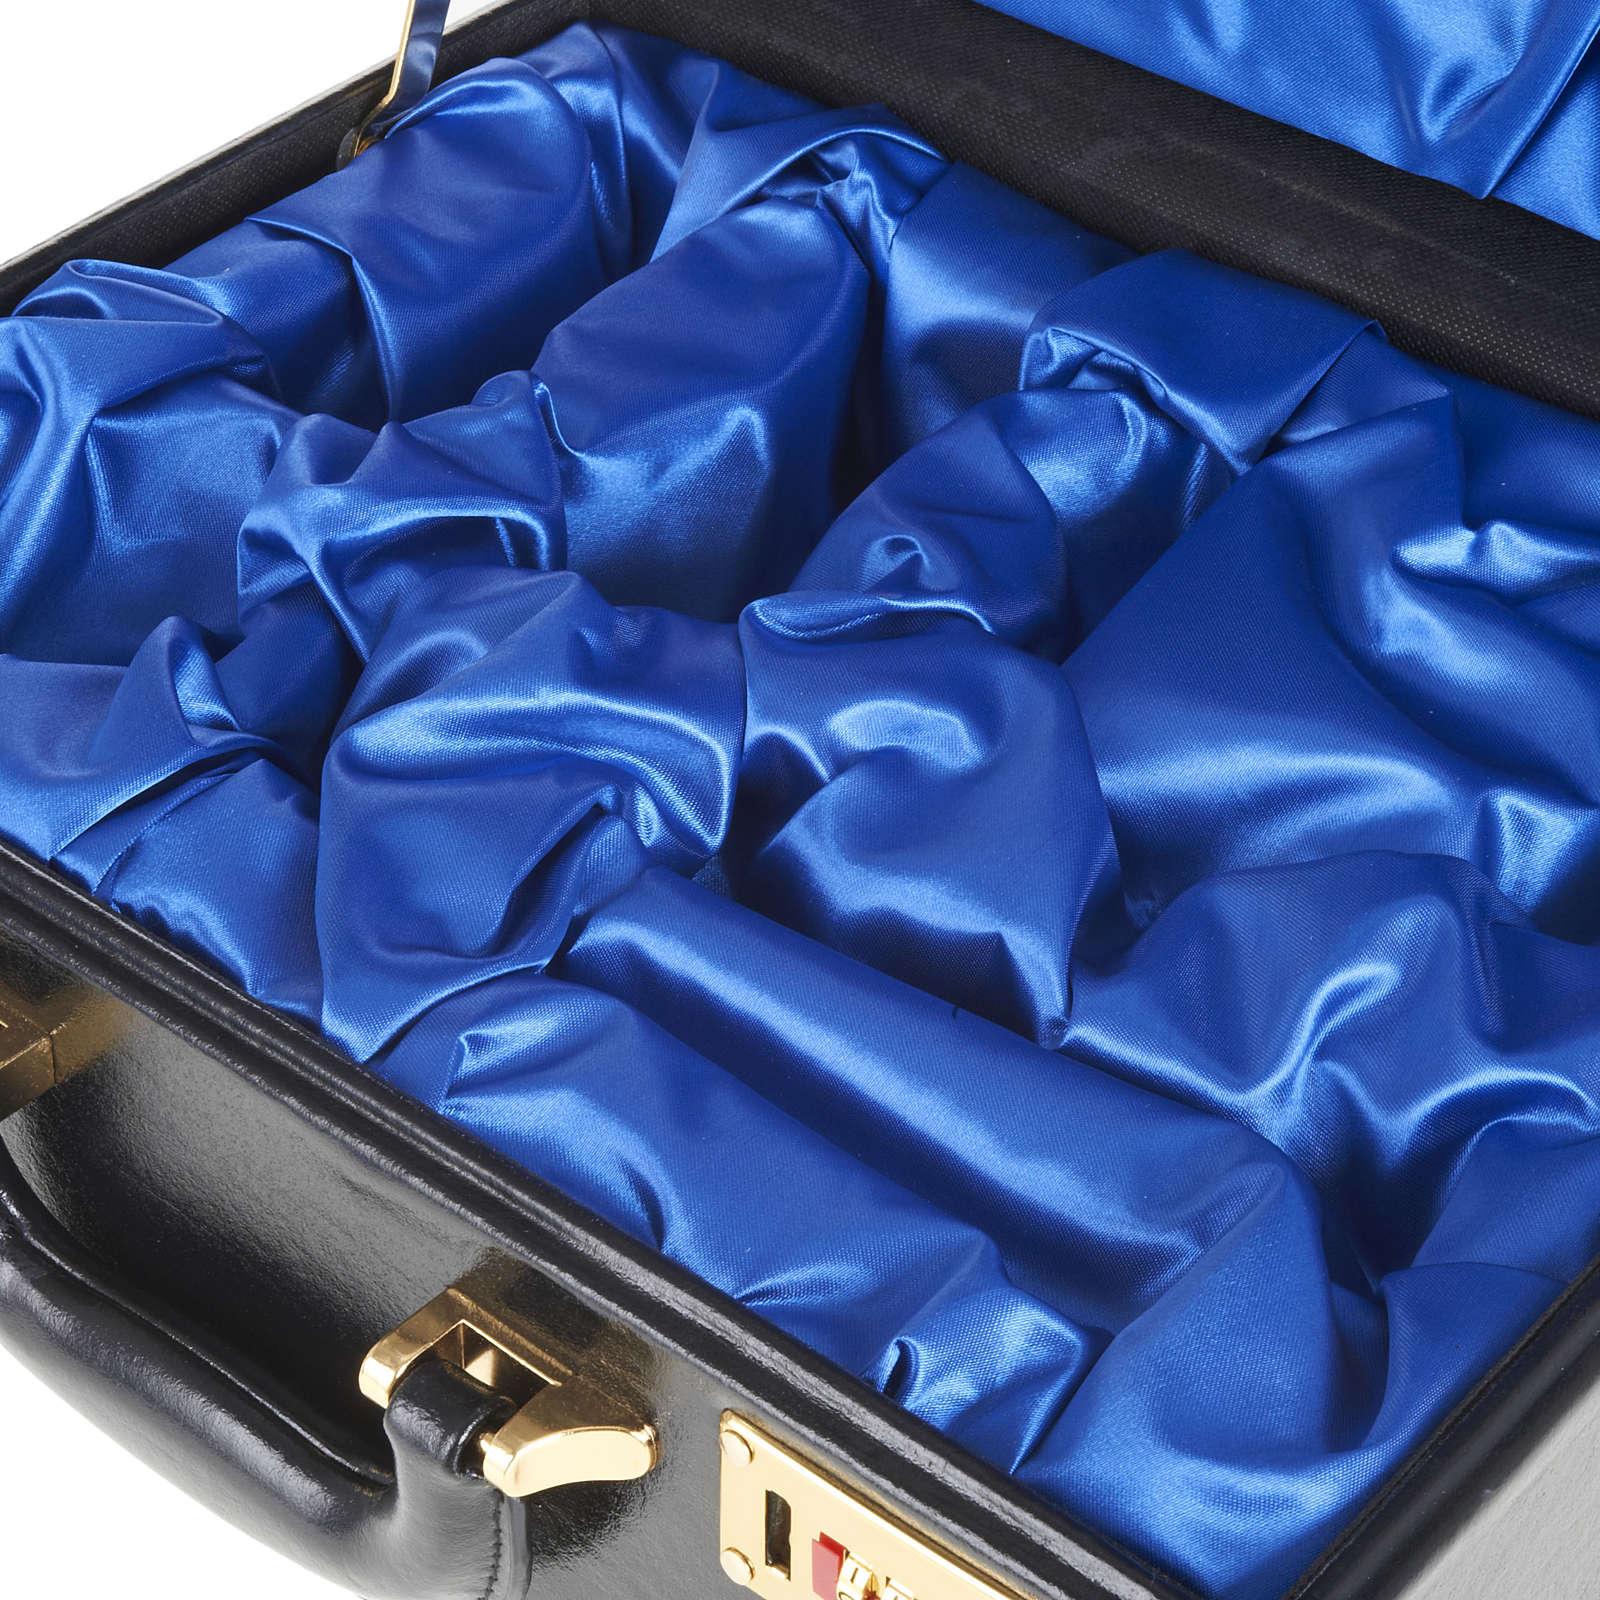 Valigia per celebrazioni vuota interno raso blu 3